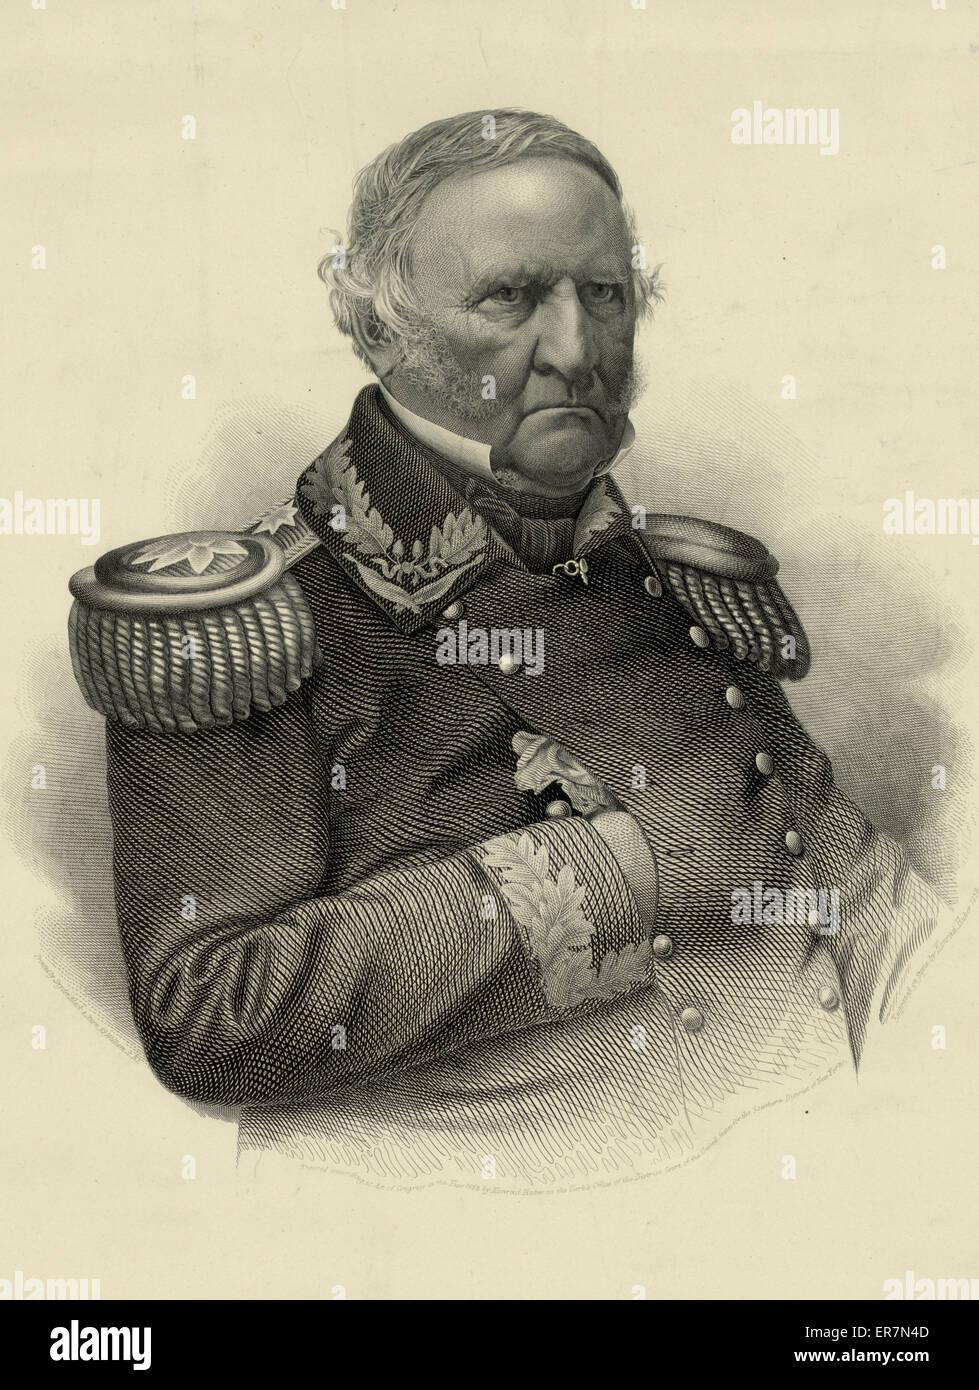 Winfield Scott. Lieut. General, Commanding U.S. Army. Date c1858 June 26. - Stock Image